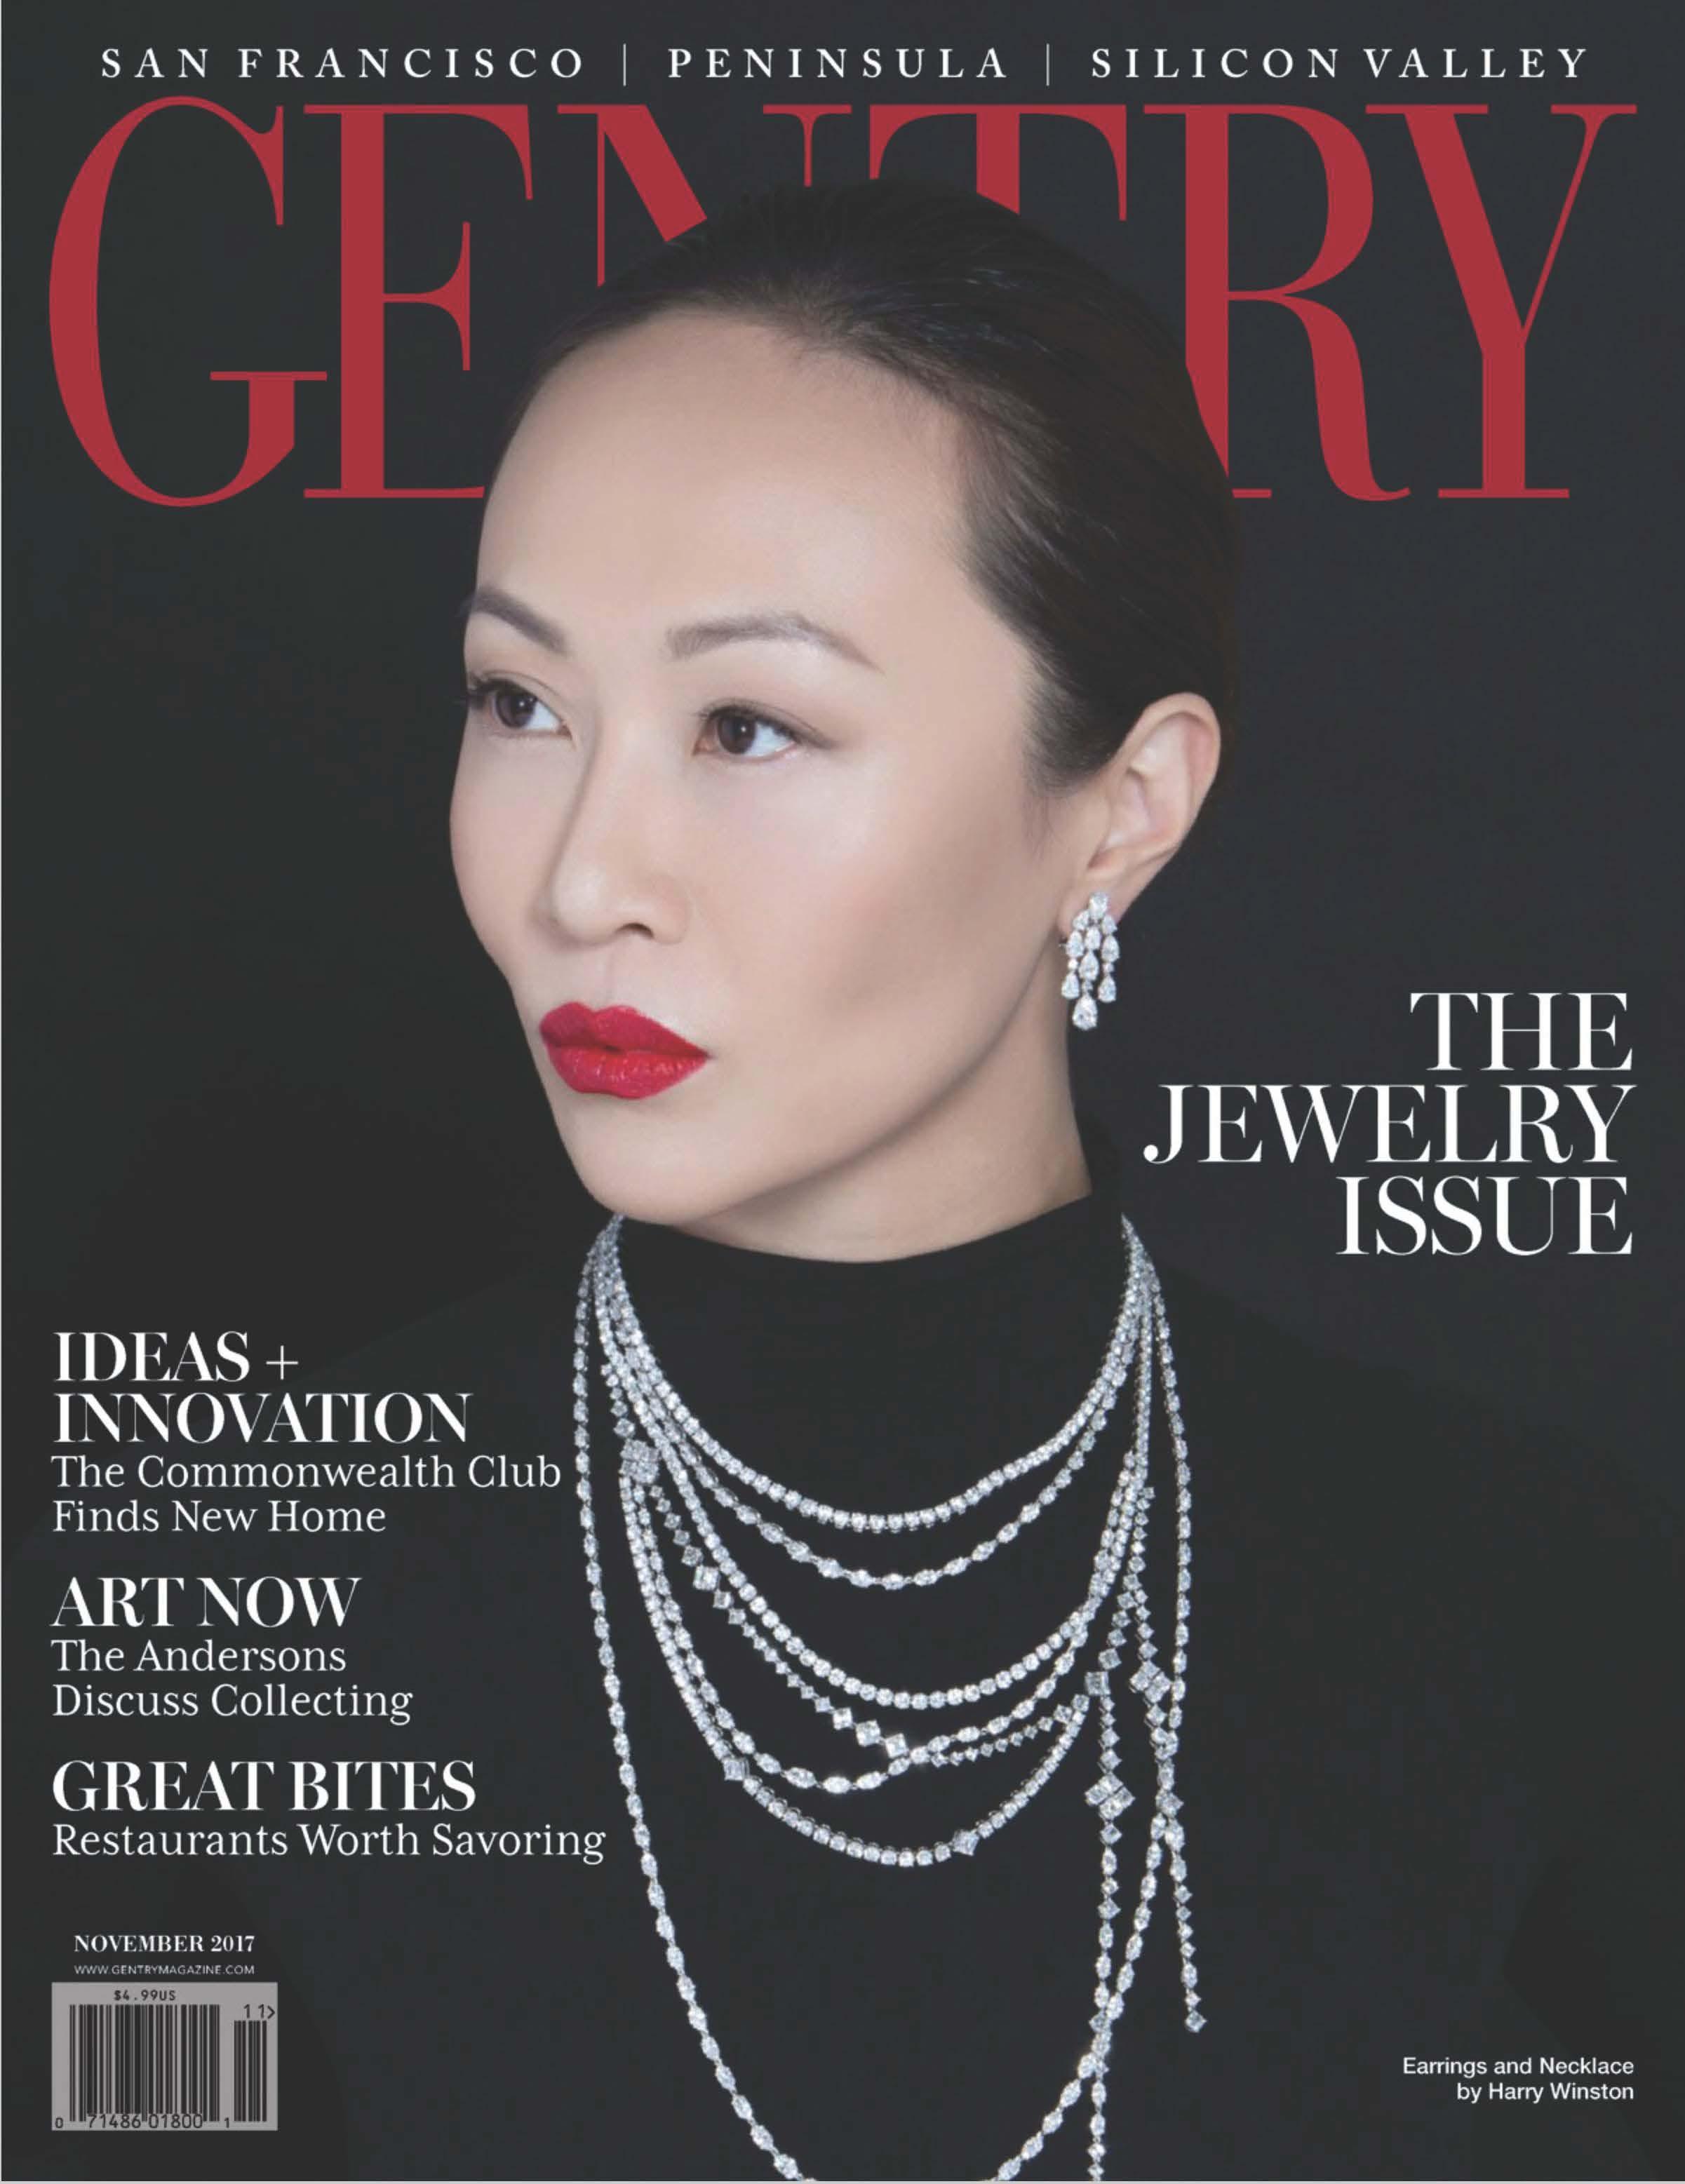 Gentry - November 2017 - Shreve_Page_1.jpg